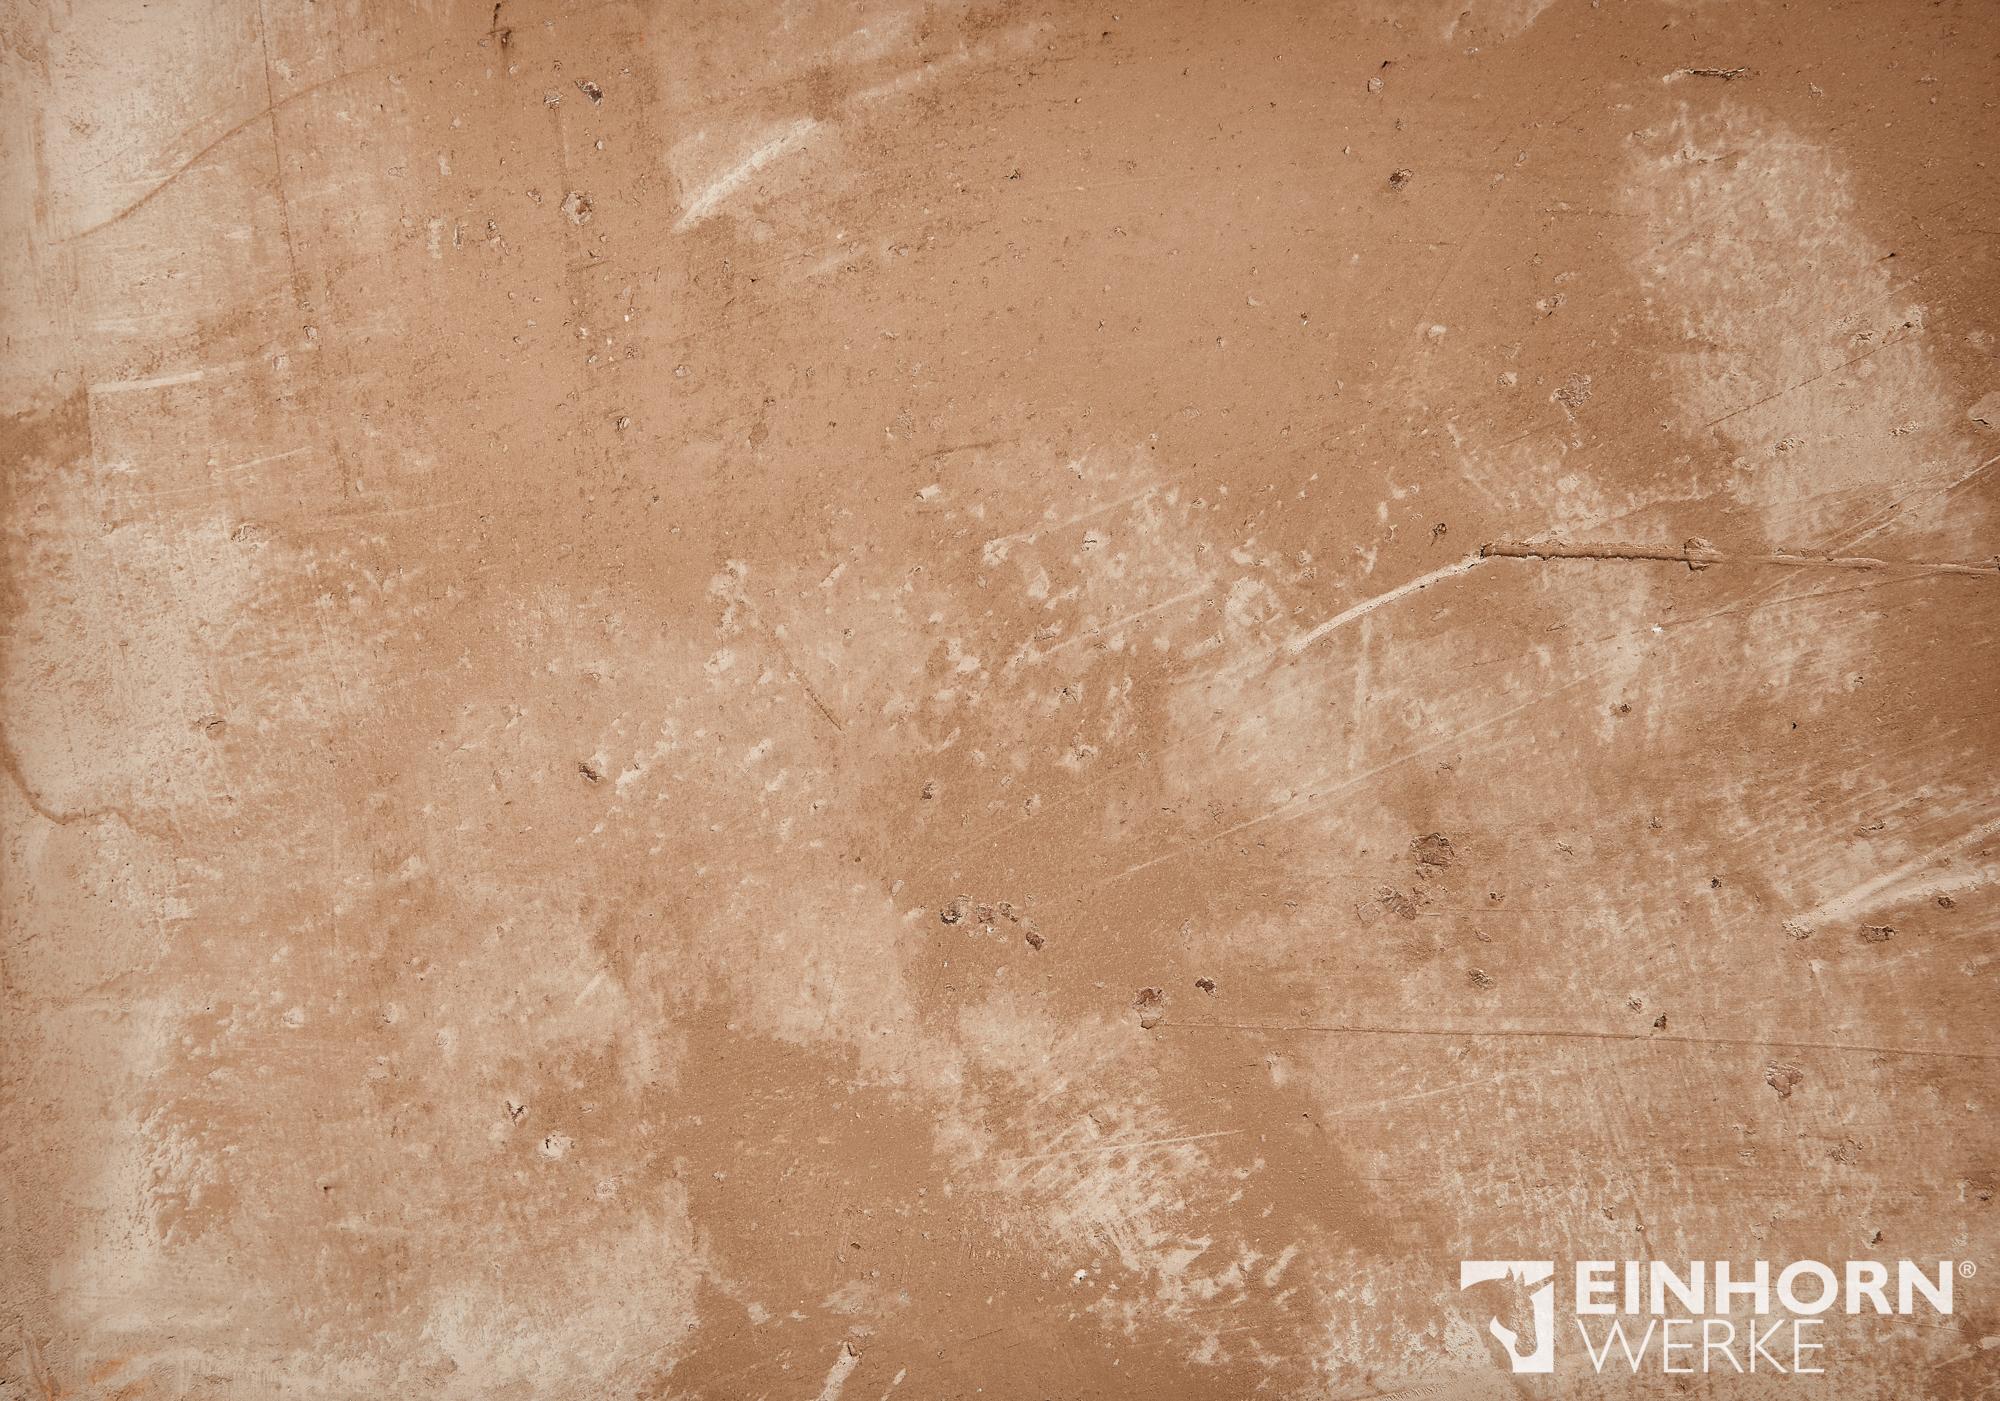 STUCCORINO 0804 + Perlglimmer grob + STUCCORINO Fresco 0802 + EINHORN WERKE ® Imprägnierung, Wandgestaltung